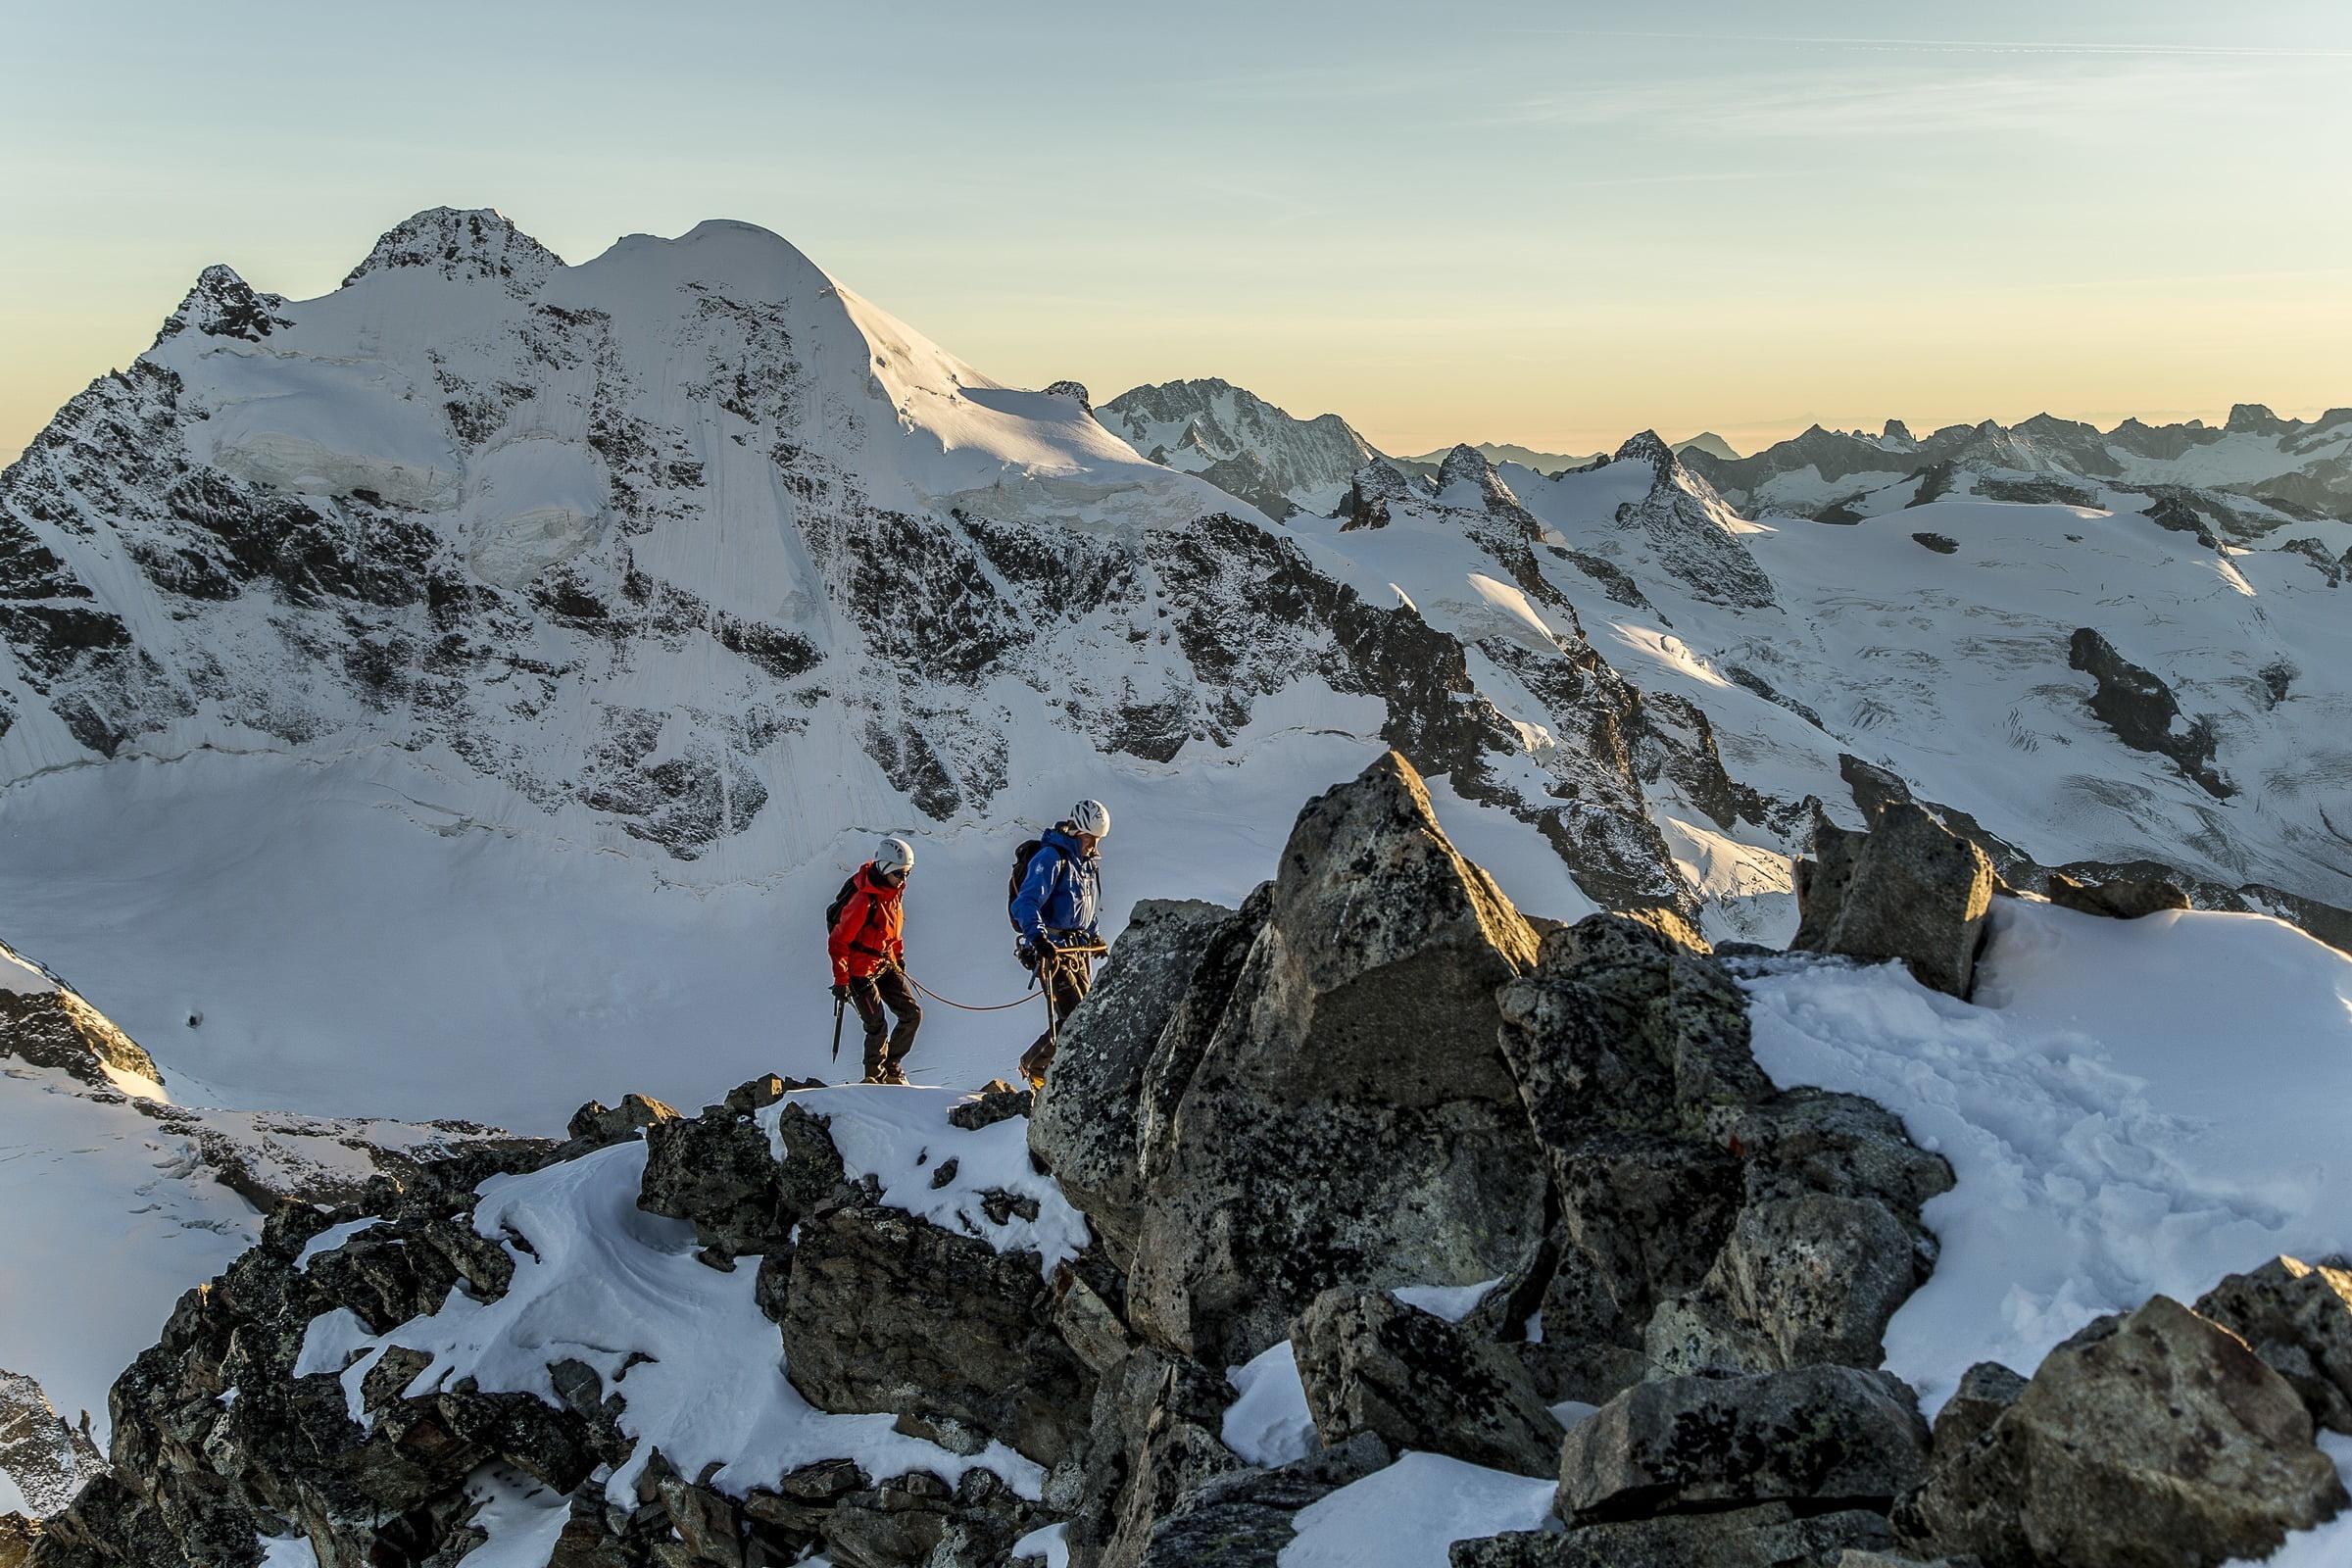 Alpine tour at Piz Morteratsch